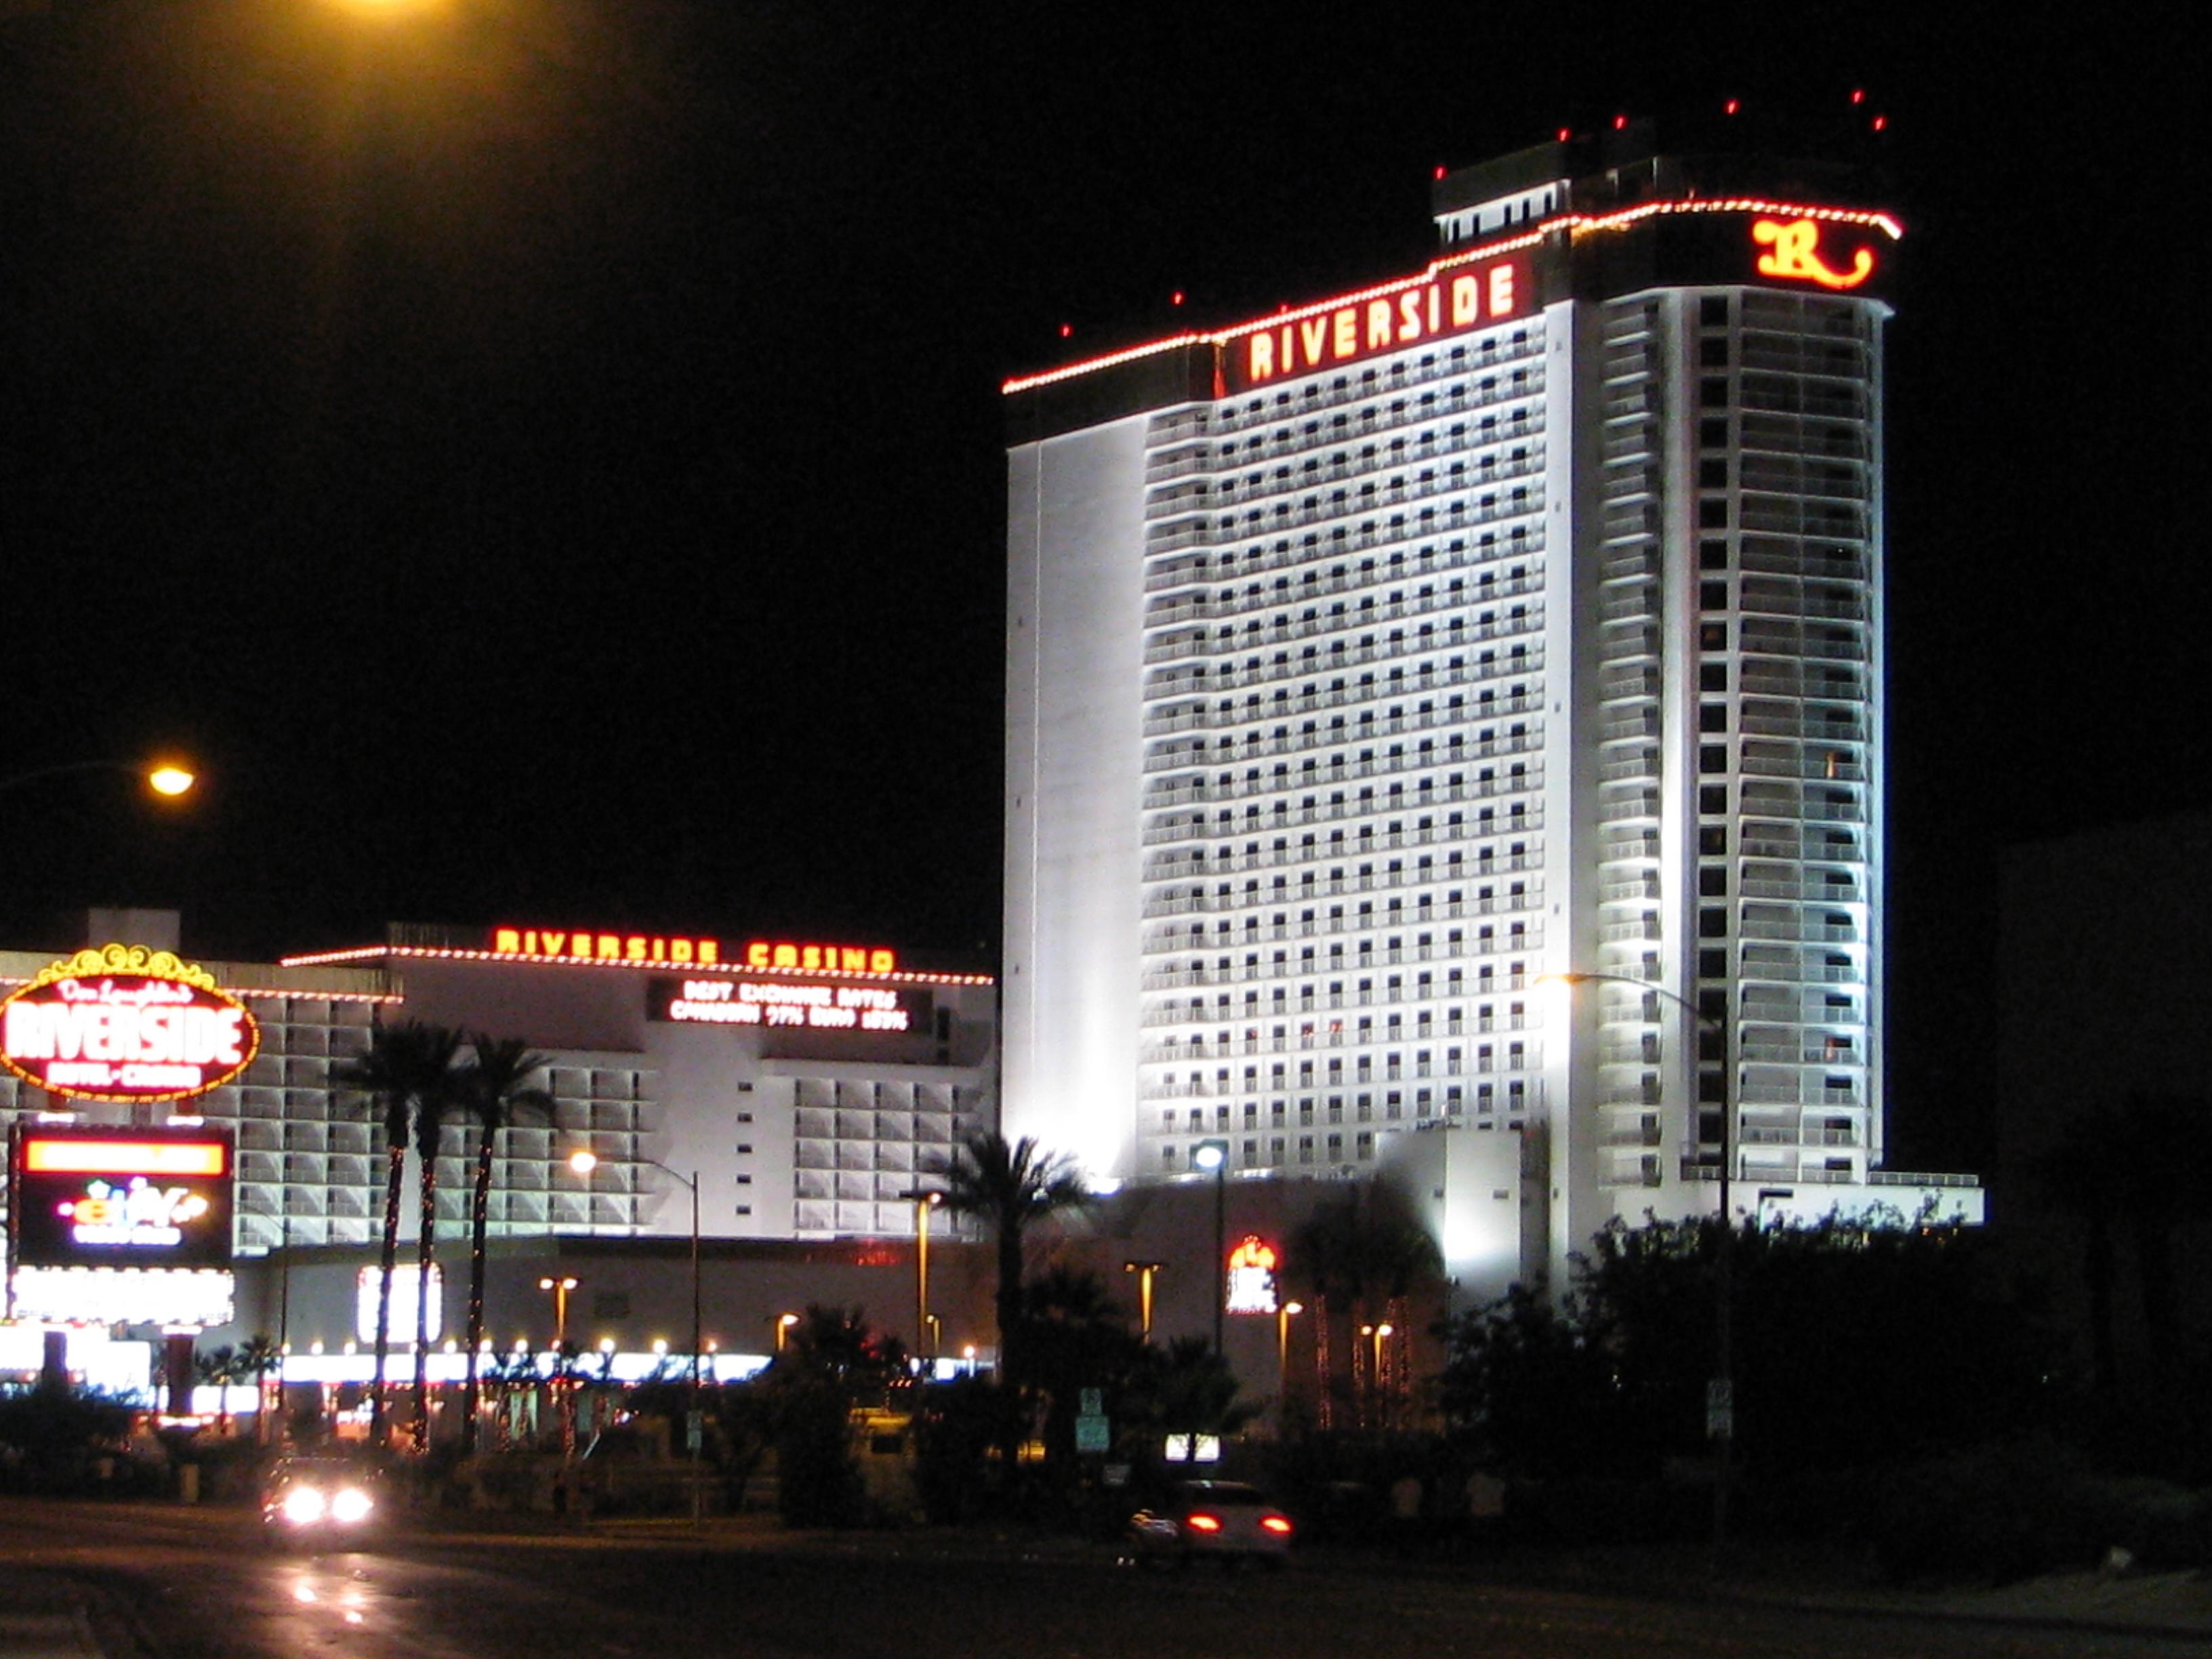 casino night party nj law